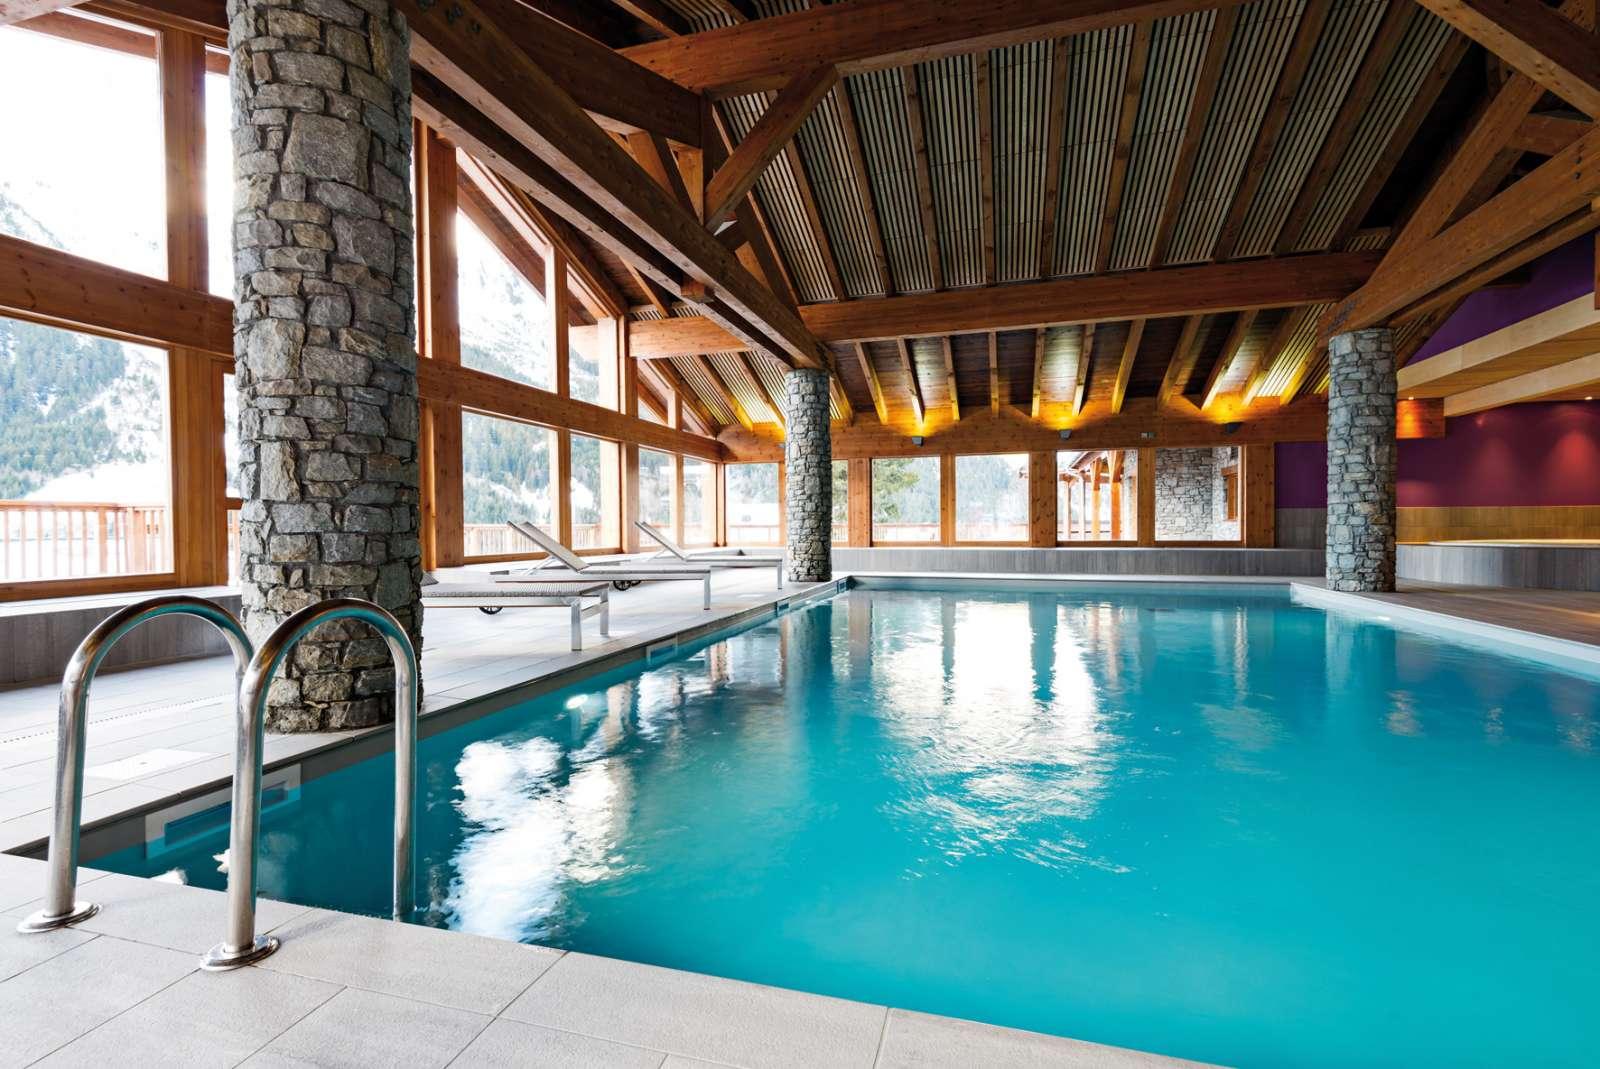 Residence les hauts de la vanoise holiday accommodation - Les jardins de la vanoise ...